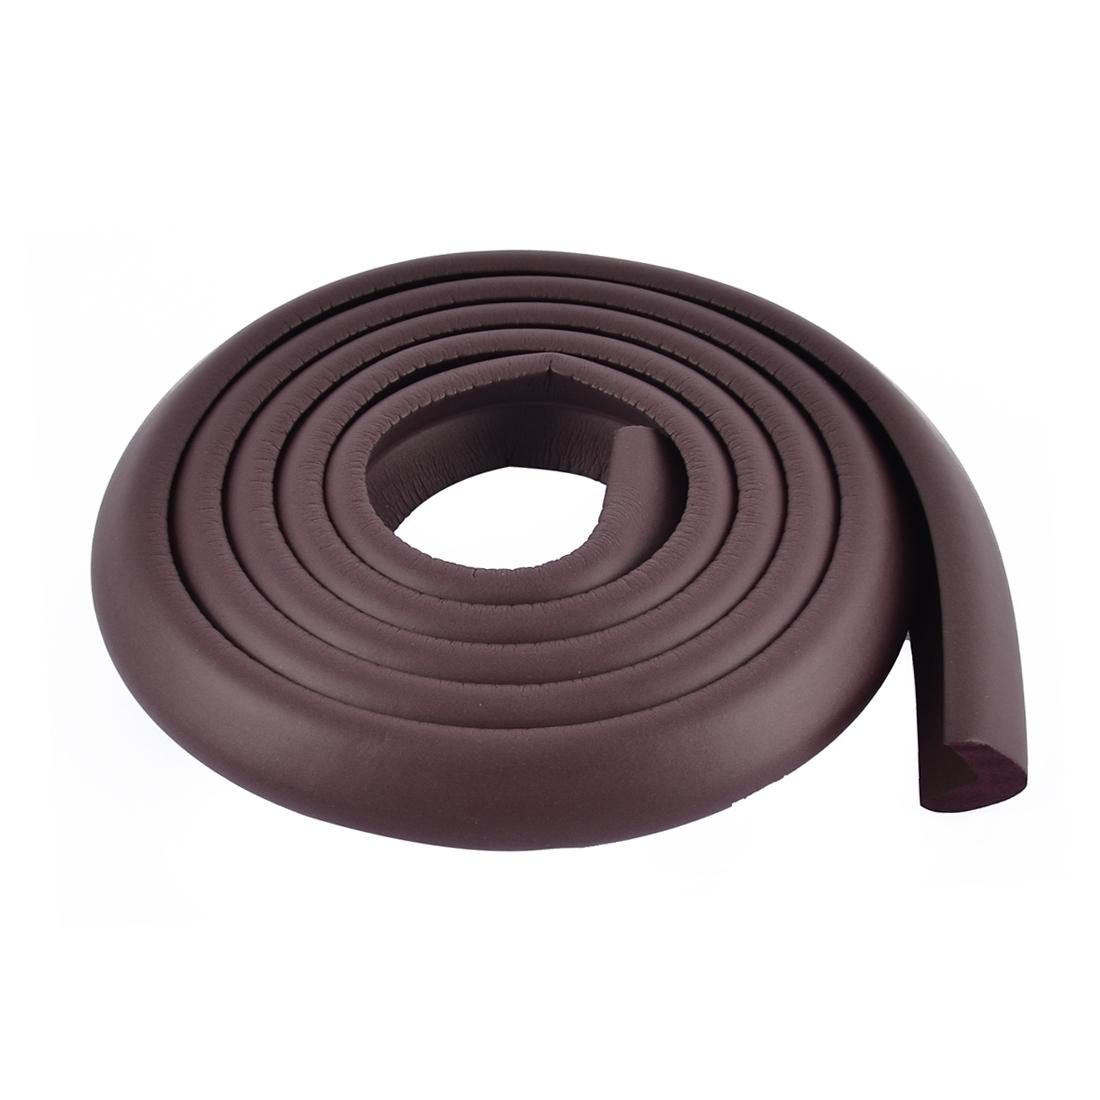 Table Corner Edge Softner Safety Protection Cushion Guard 24mm x 8mm Dark Brown